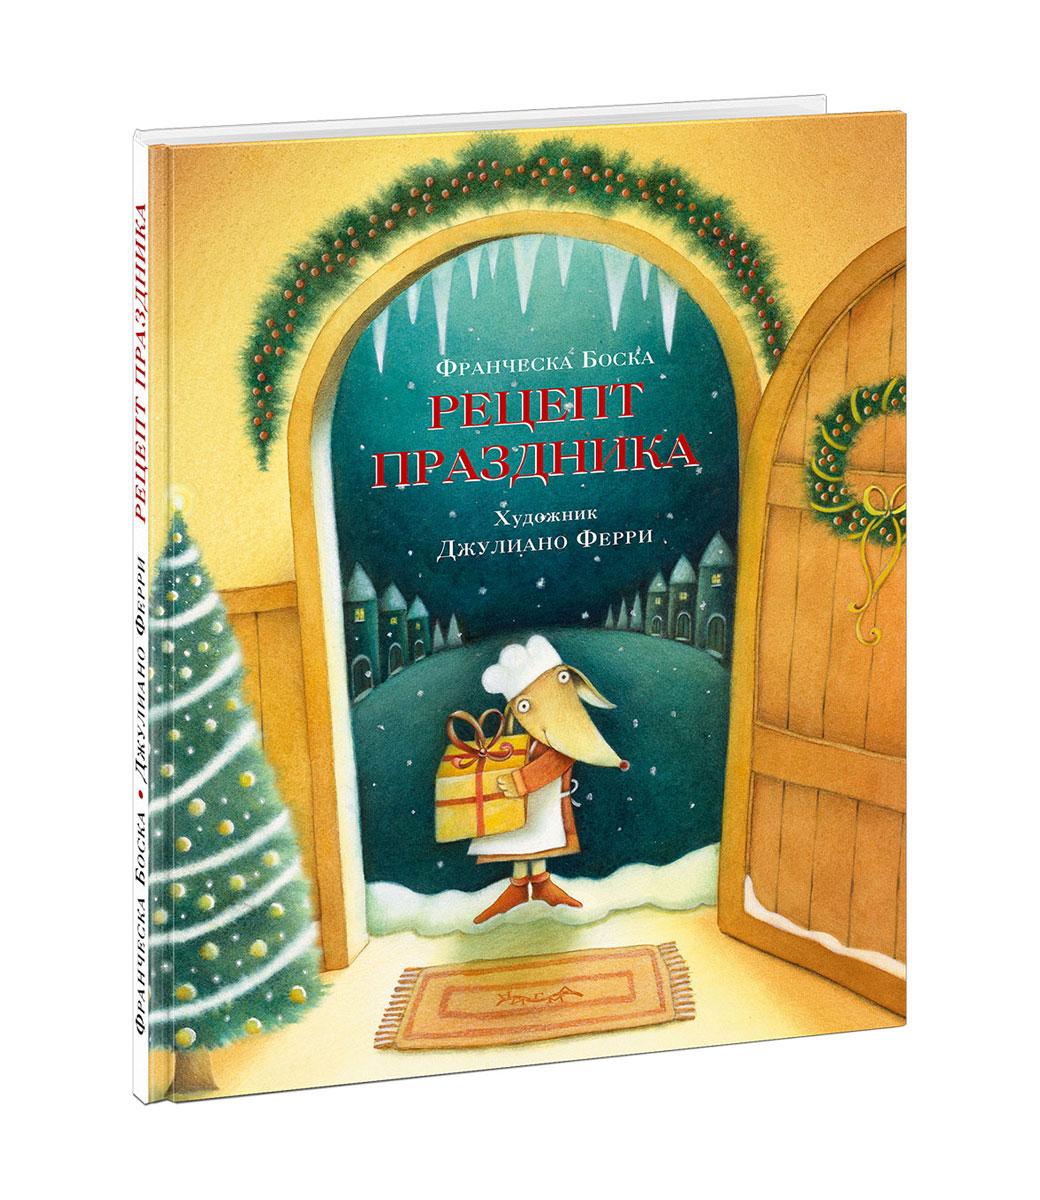 Франческа Боска Рецепт праздника ISBN: 978-5-4335-0673-2